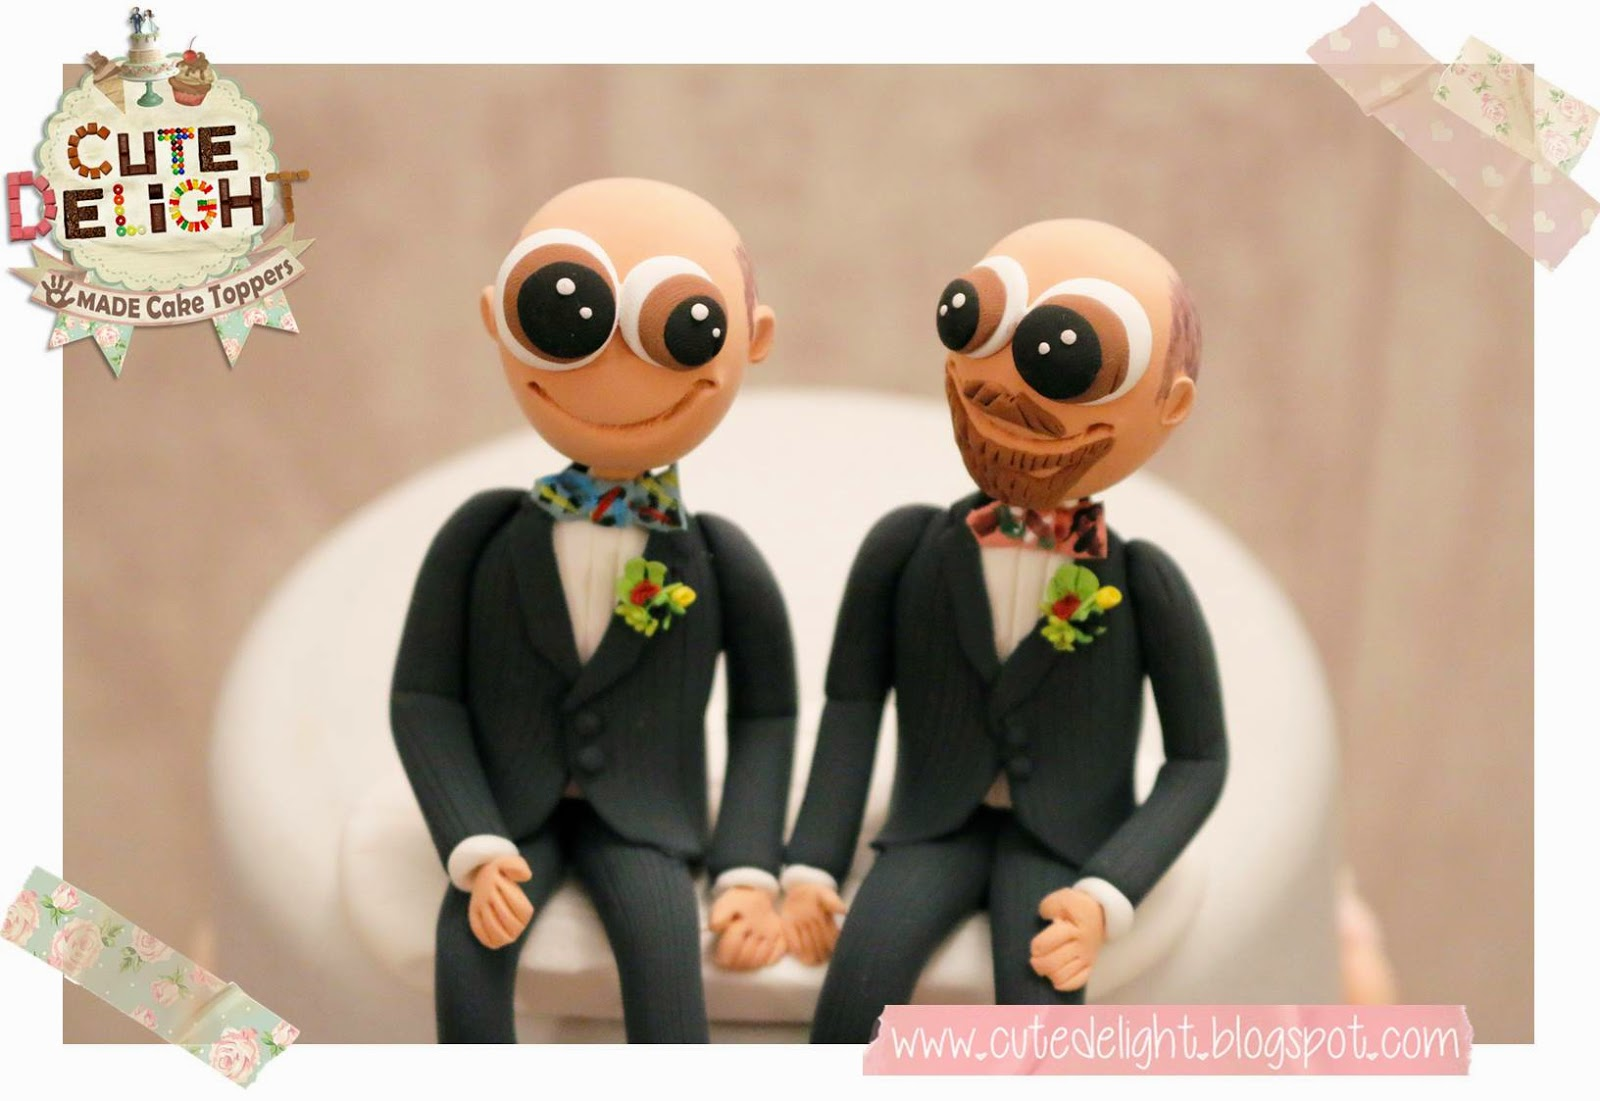 Wedding Cake Toppers Custom Cake Topper Funny Cake Toppers Cake